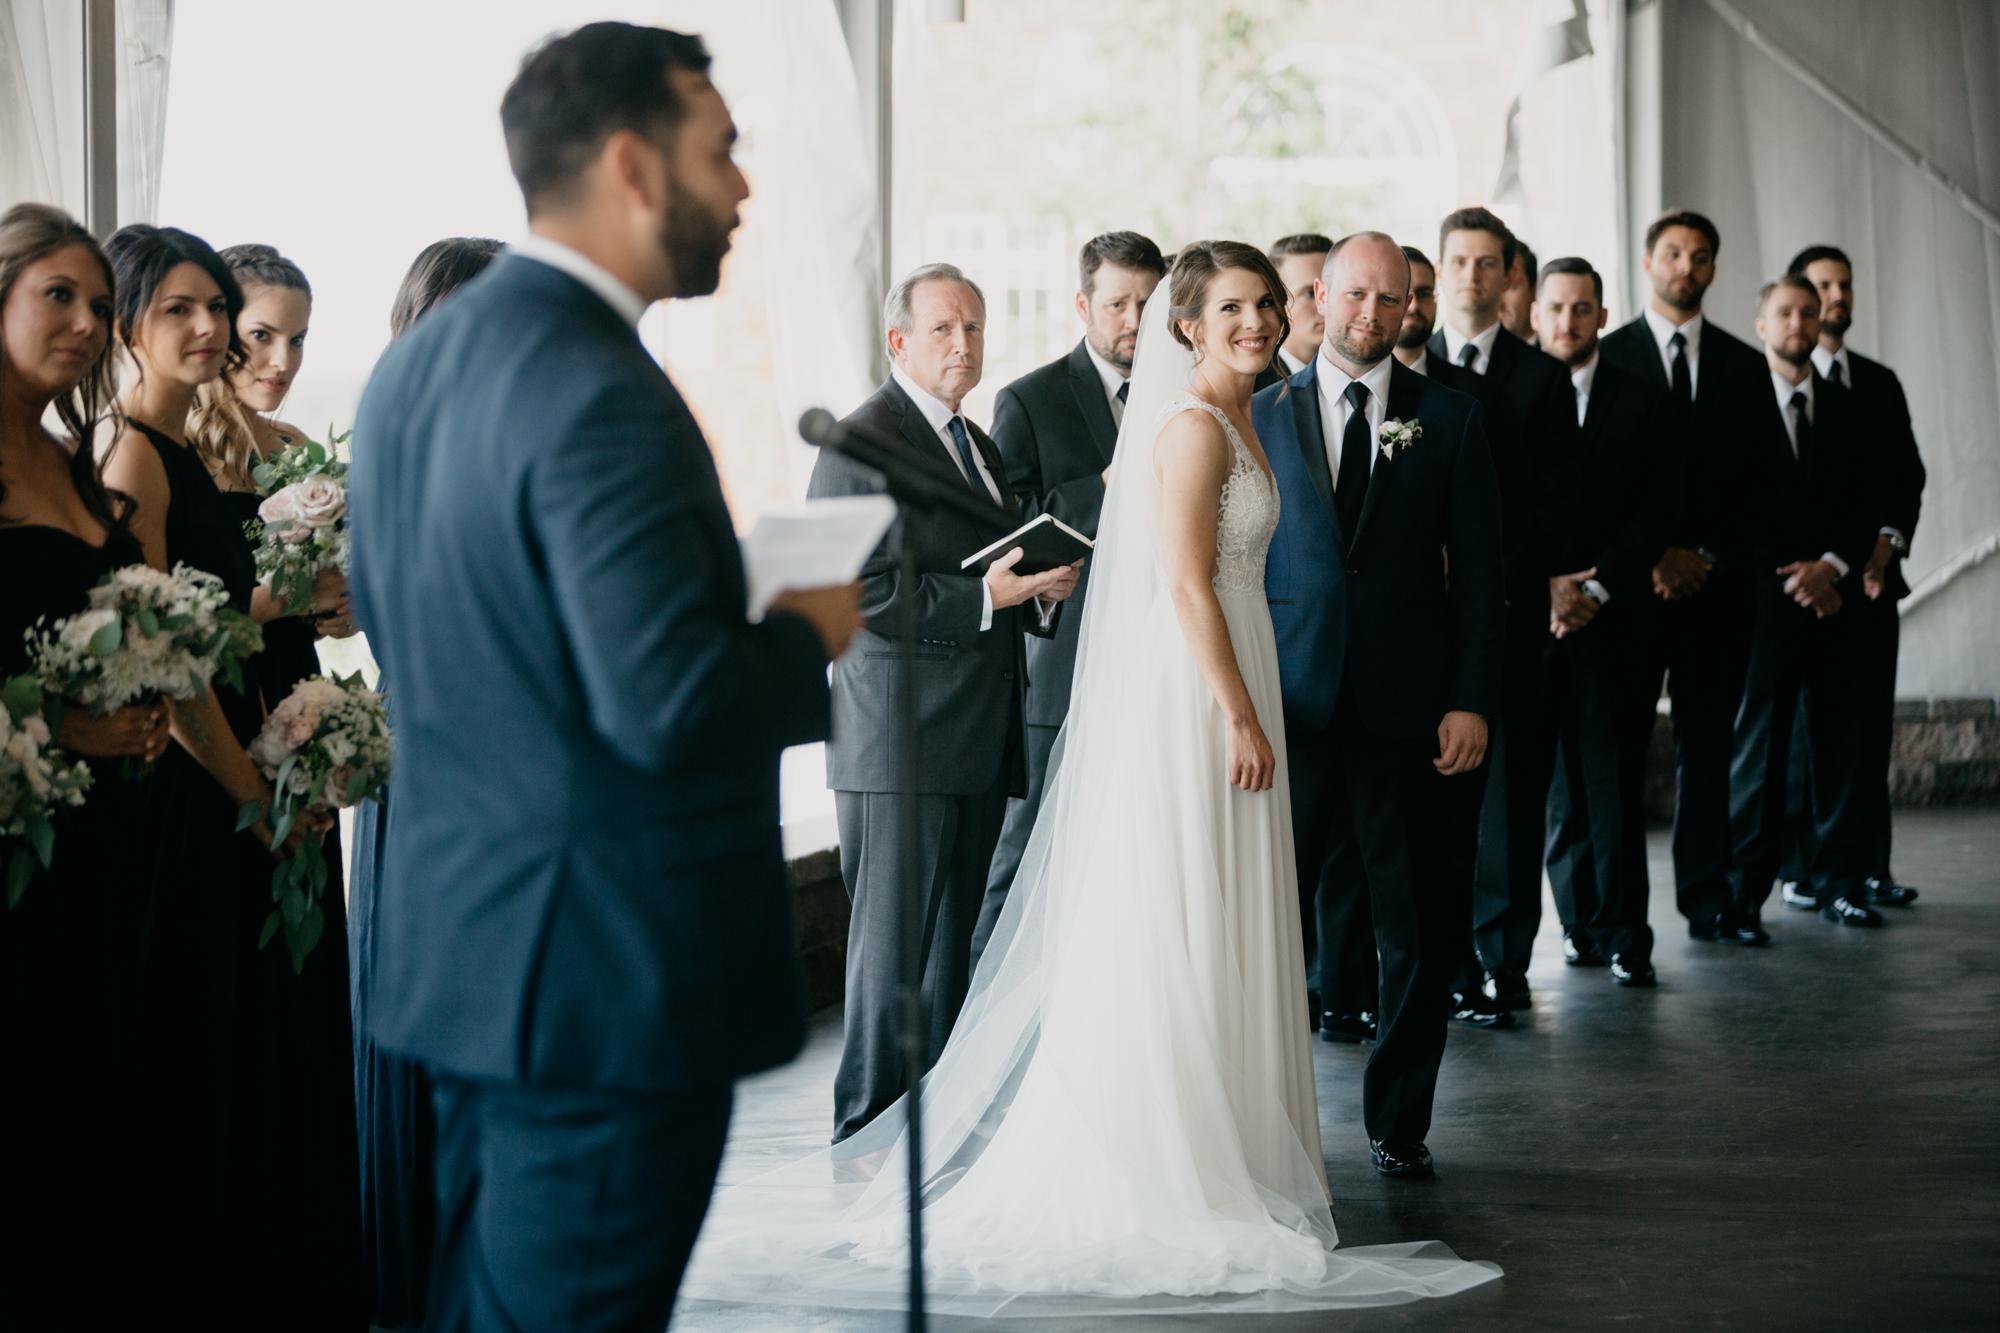 Jaclyn_Andrew_quincy_massachusetts_wedding014.jpg